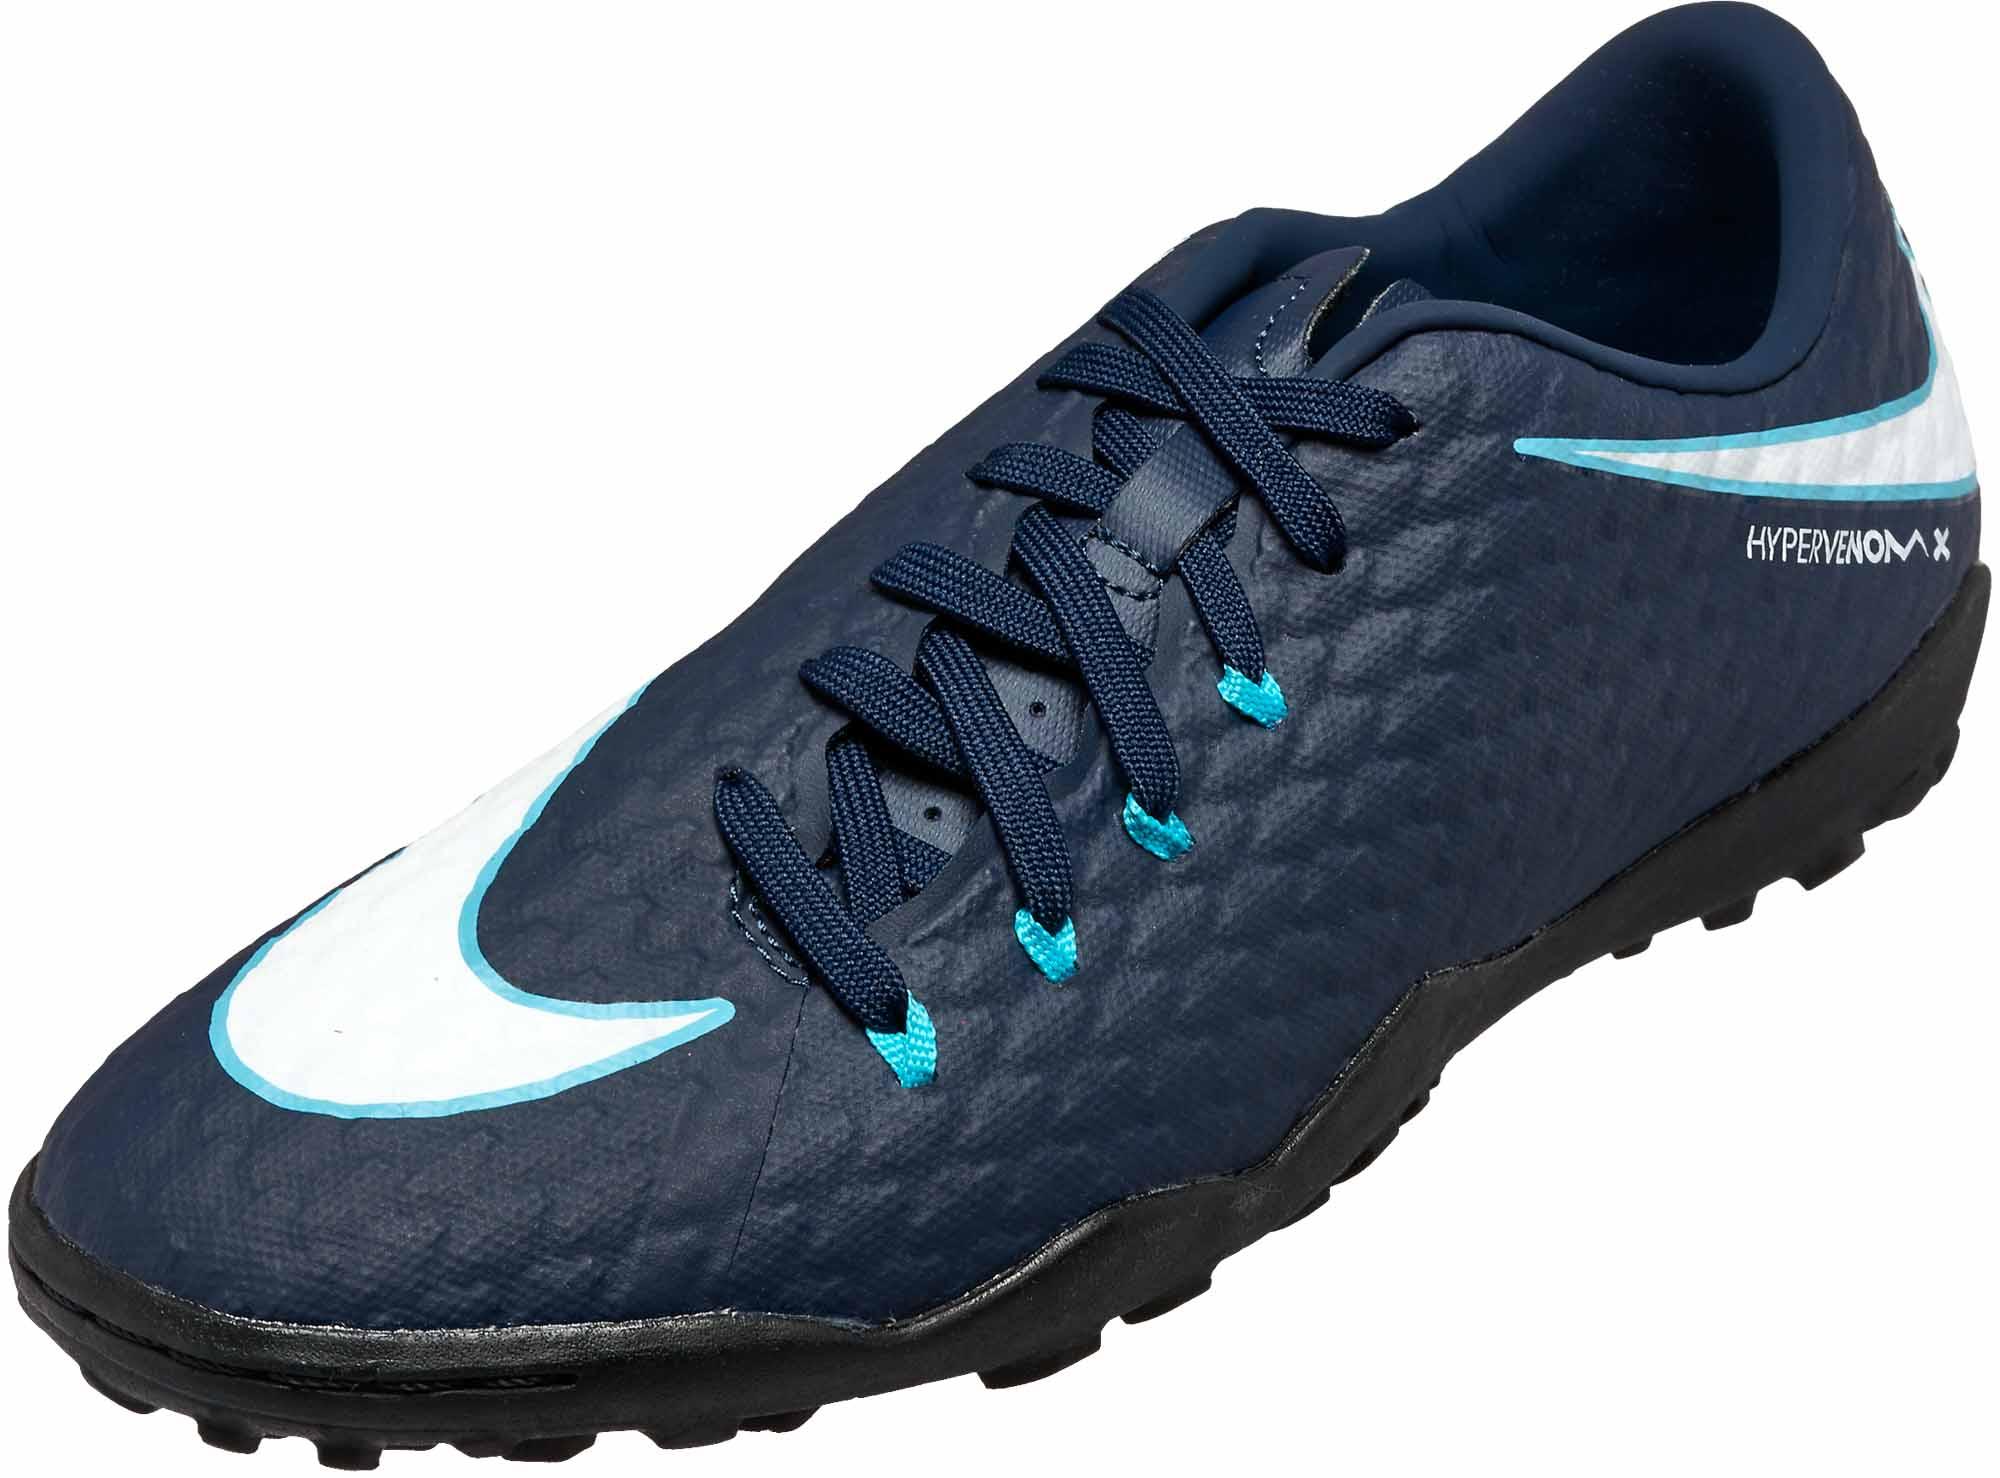 newest d035a 98d0c Nike Hypervenom Phelon III TF – Obsidian/White